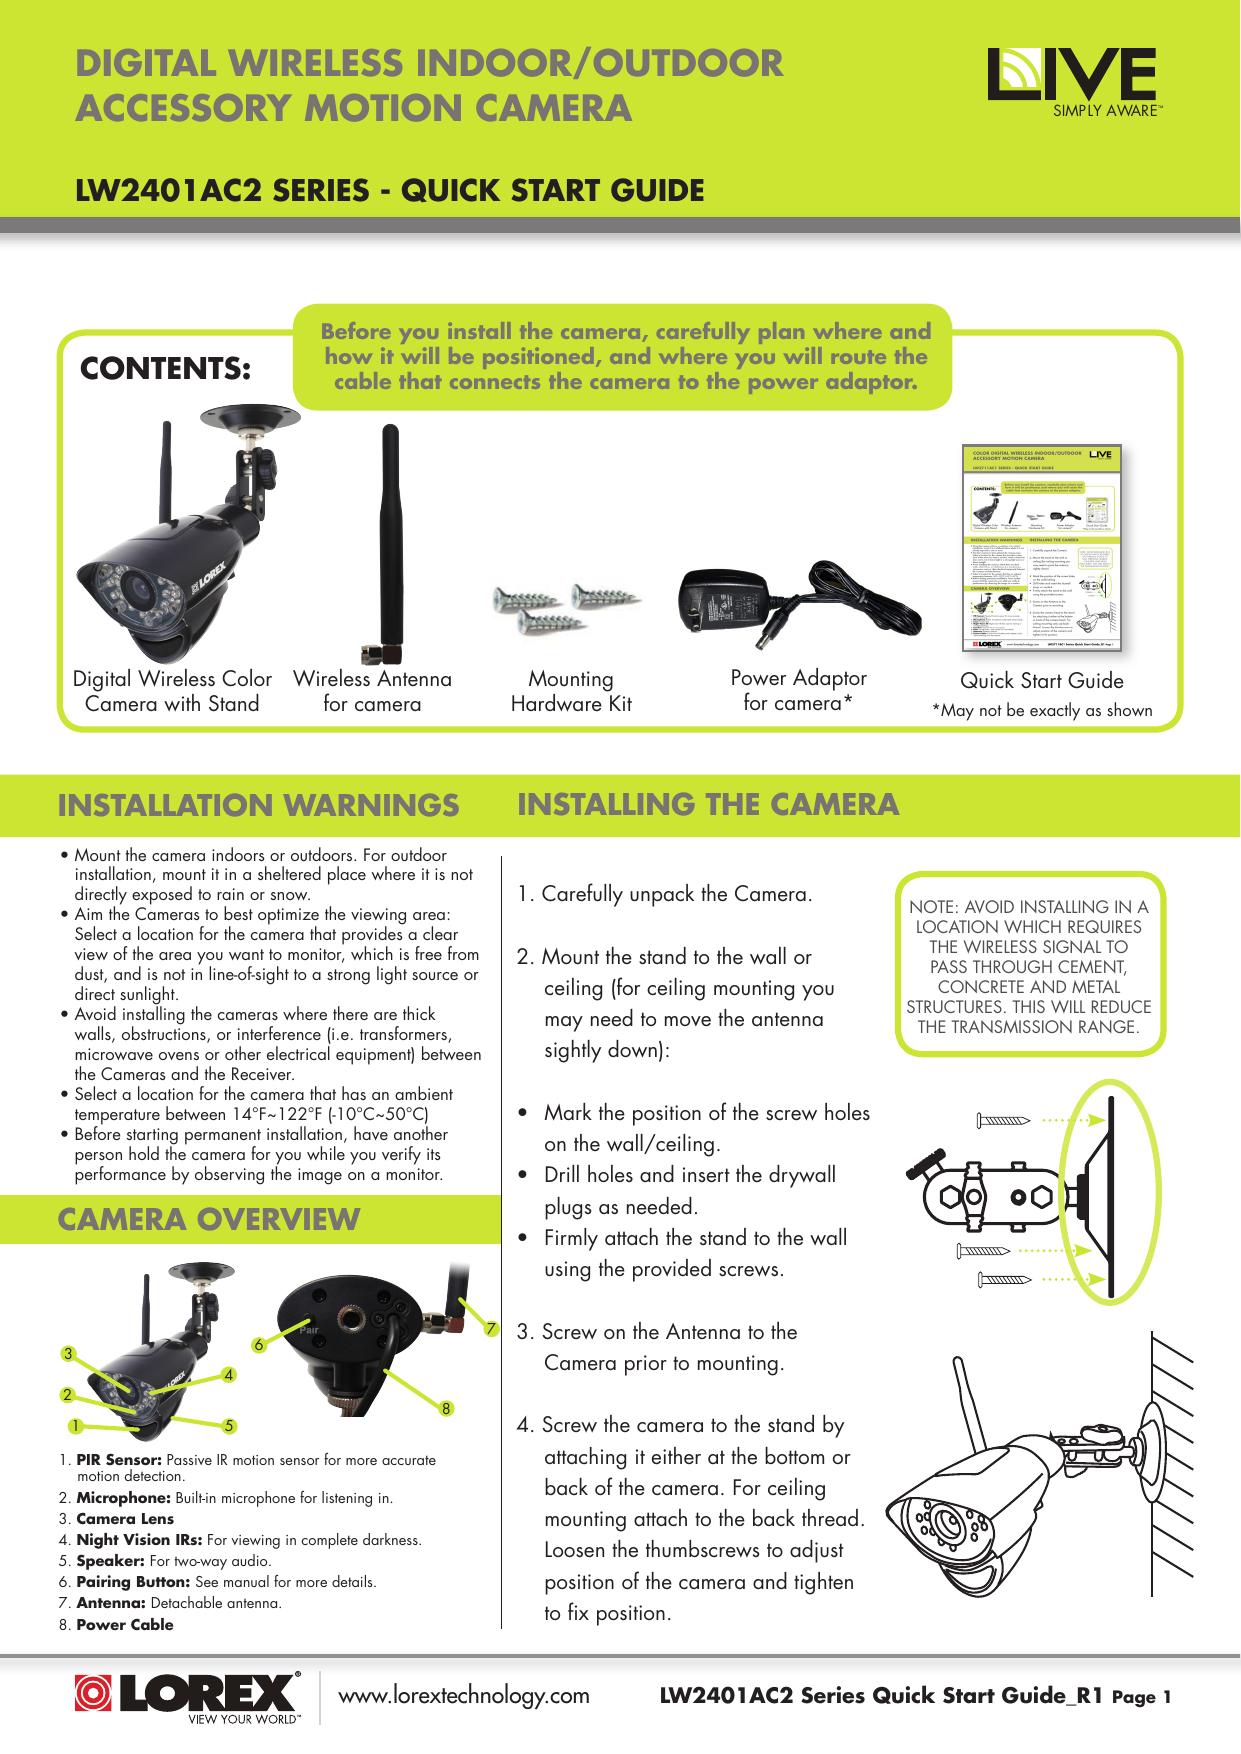 Lorex Installation Manual R33gtraudiowiringdiagram R33 Gtr Project Animal 183 Array Indoorzoutdoor Wireless Accessory Camera For Live Sense Home Rh Usermanual Wiki